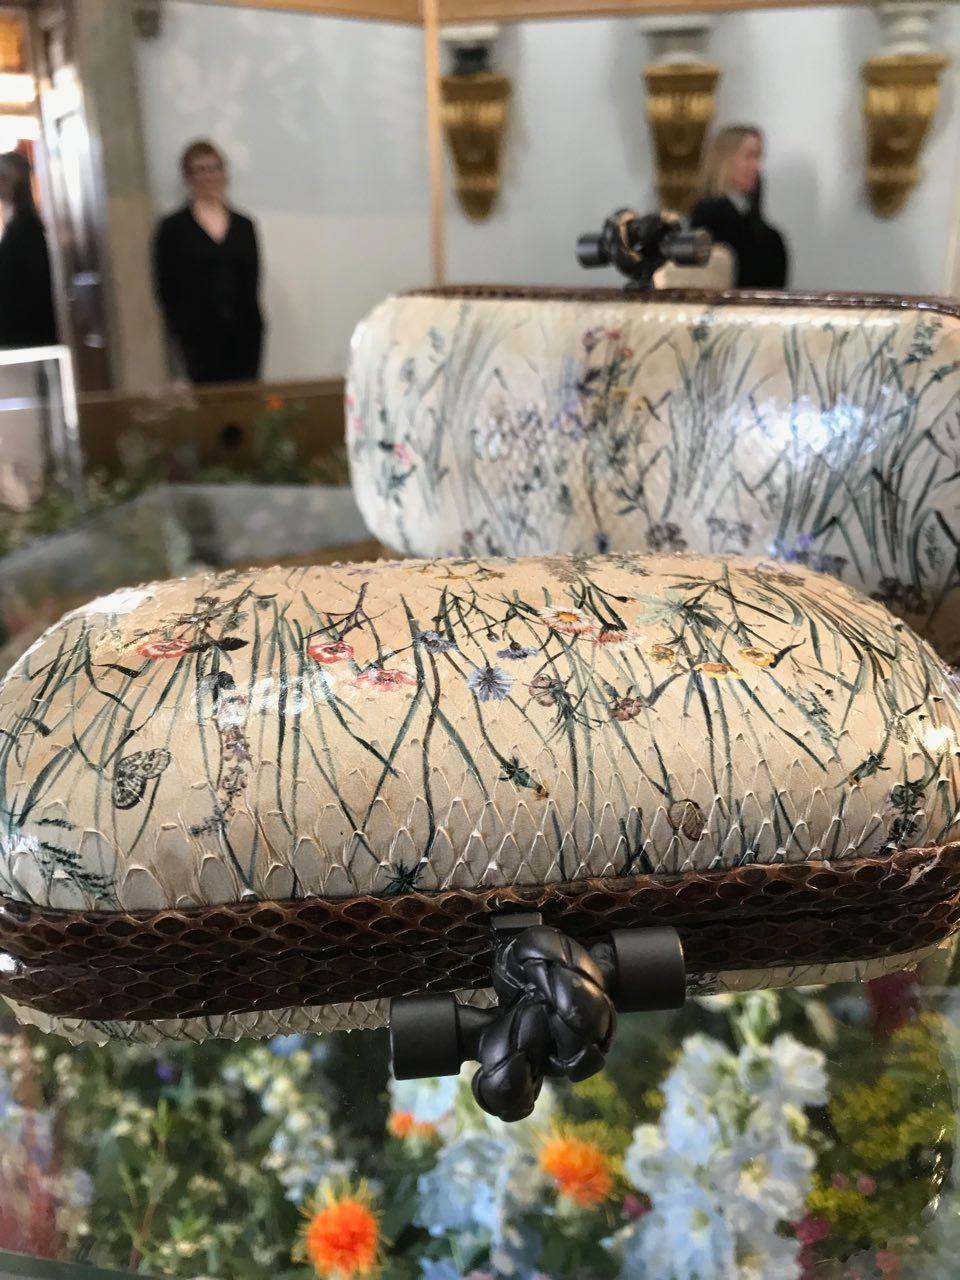 Hand painted Bottega Veneta snakeskin clutch bag, displayed above fresh flowers